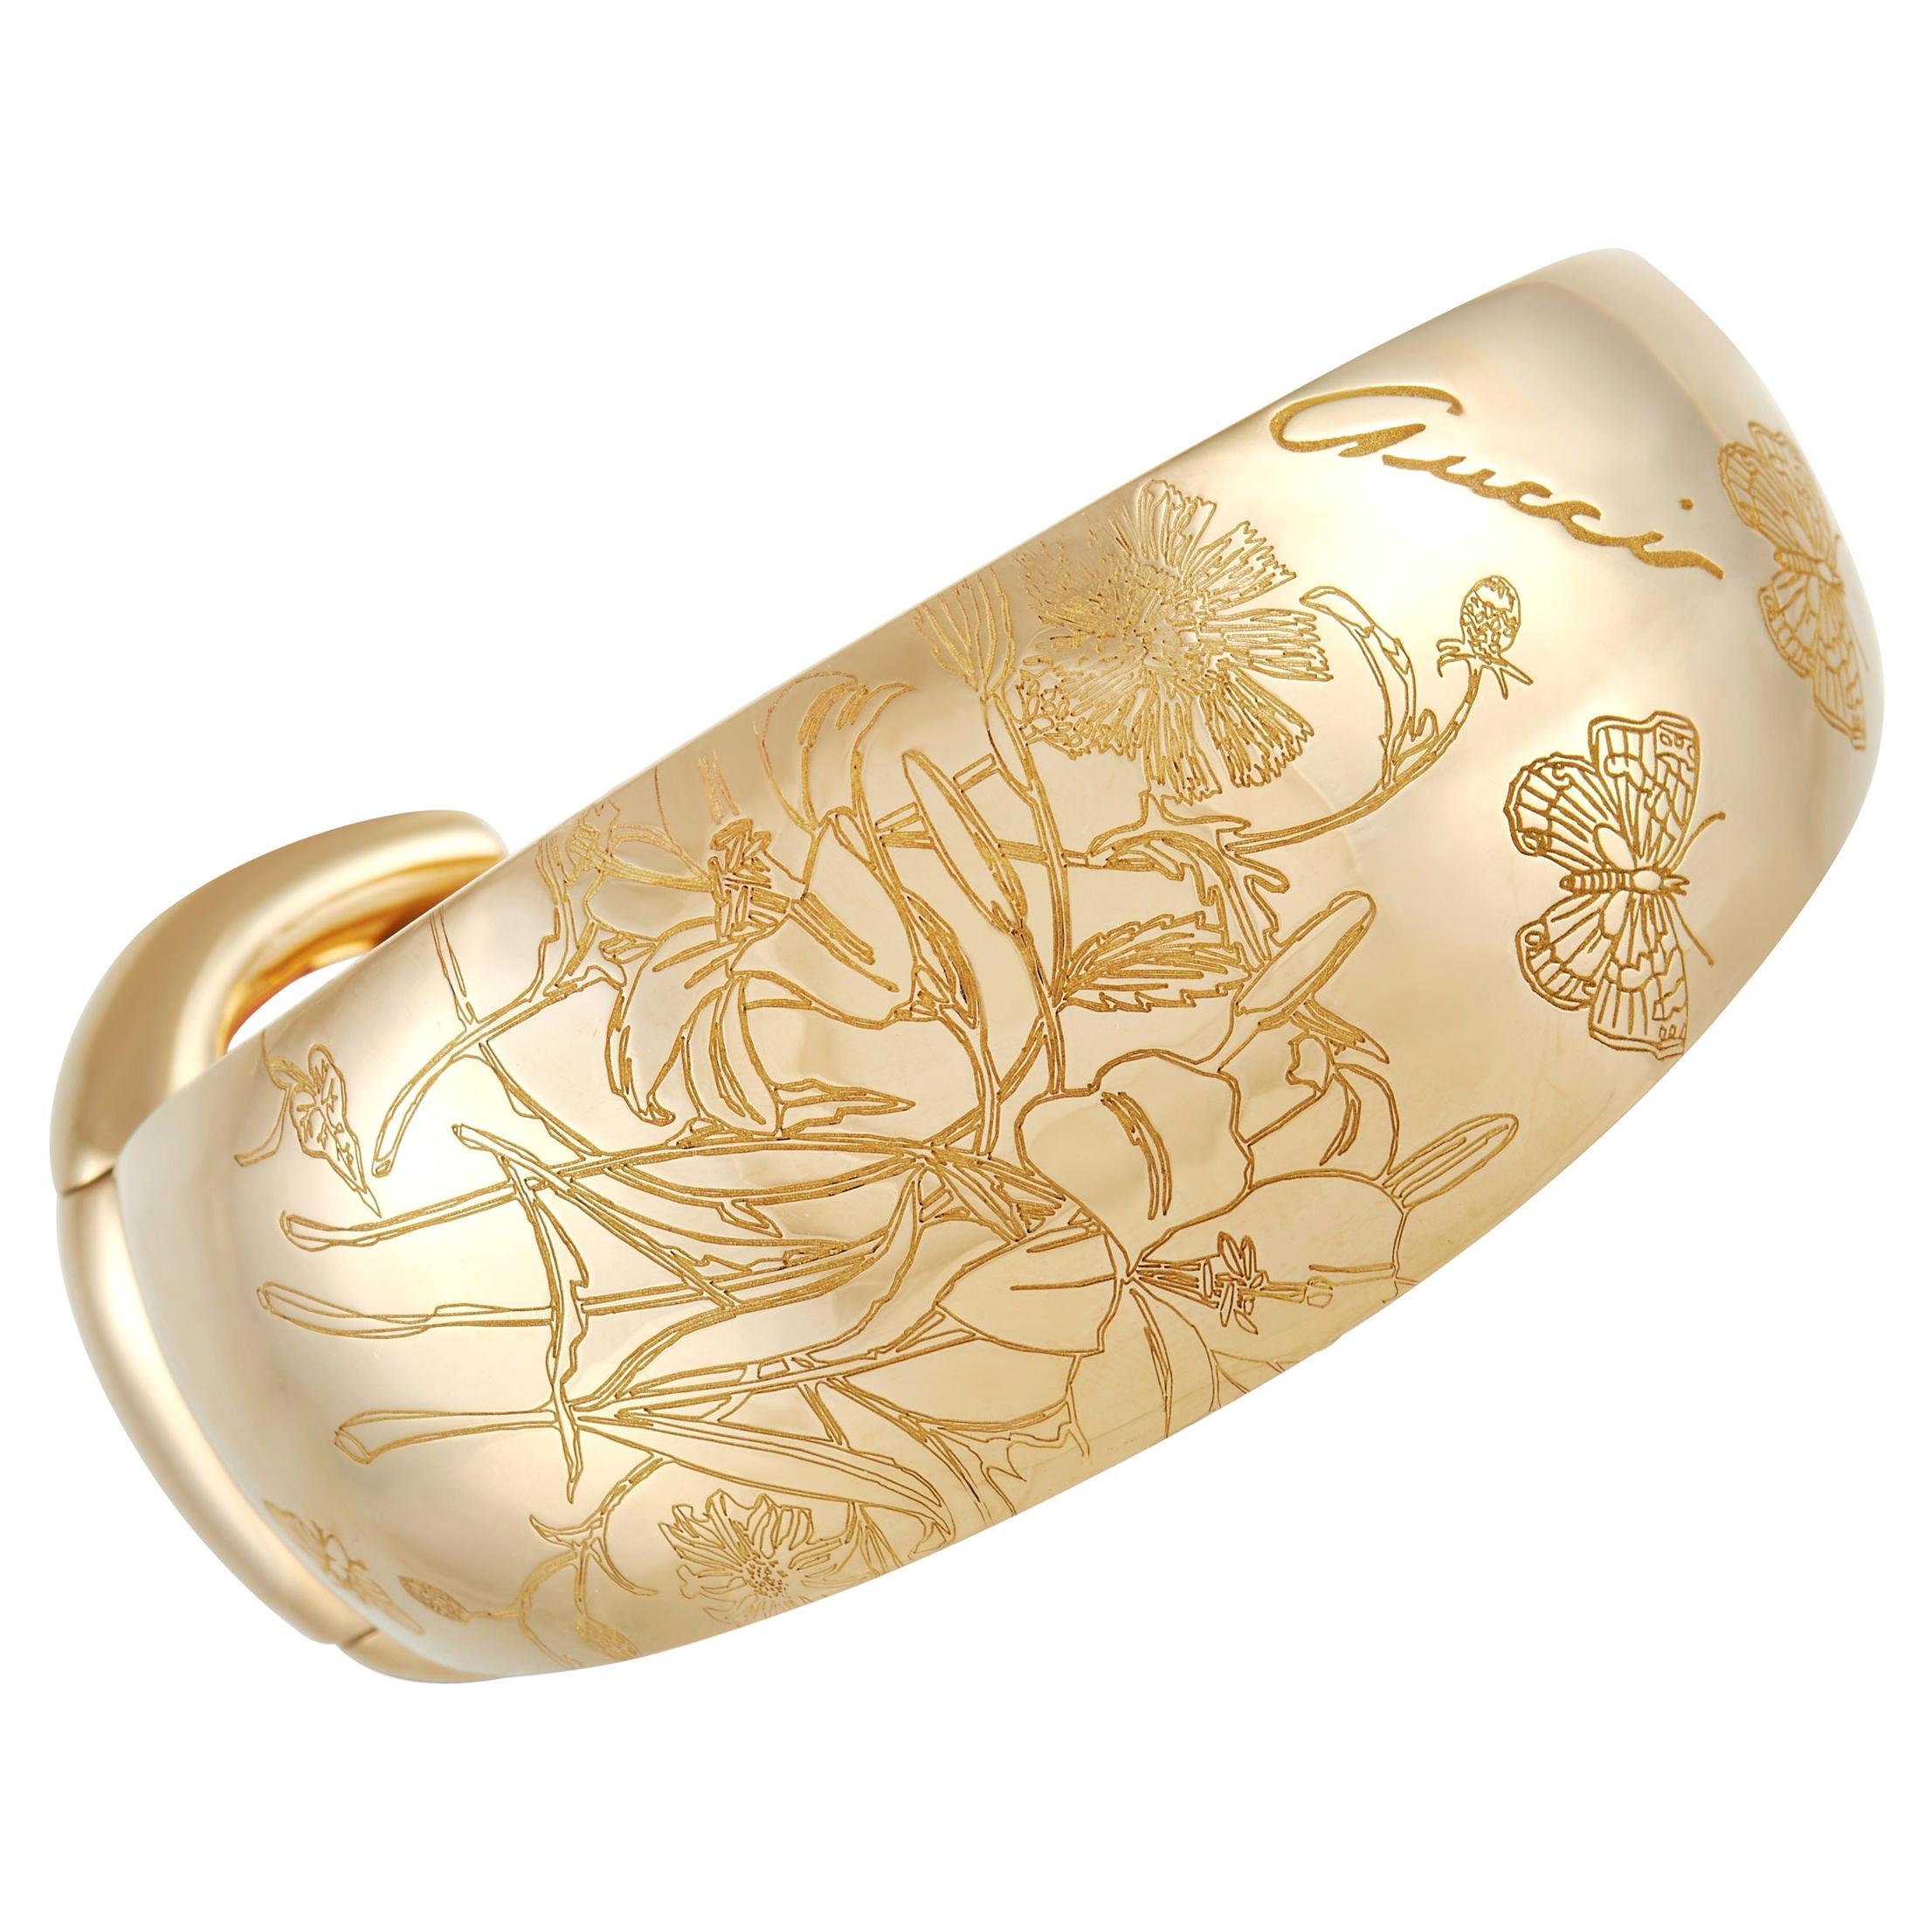 Gucci Horsebit Flora 18K Yellow Gold Coral Bracelet